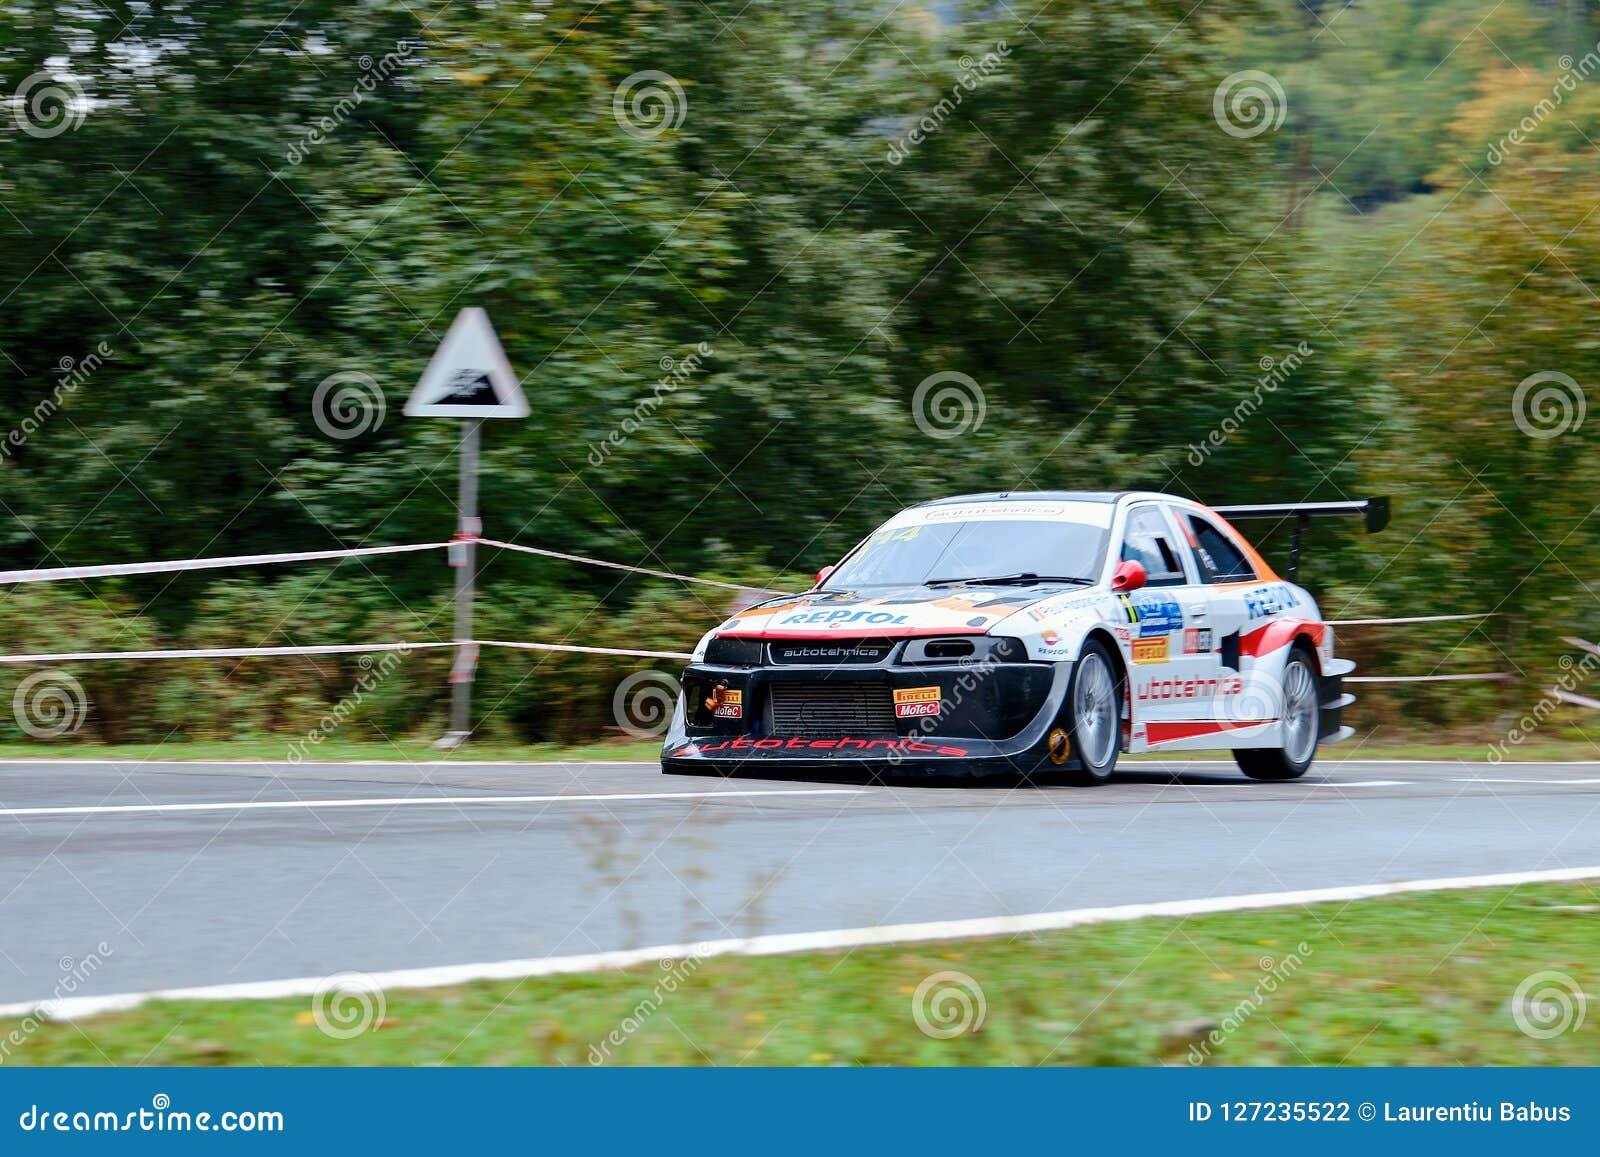 Mitsubishi Lancer Evo V Tuning Rally Car Editorial Photography